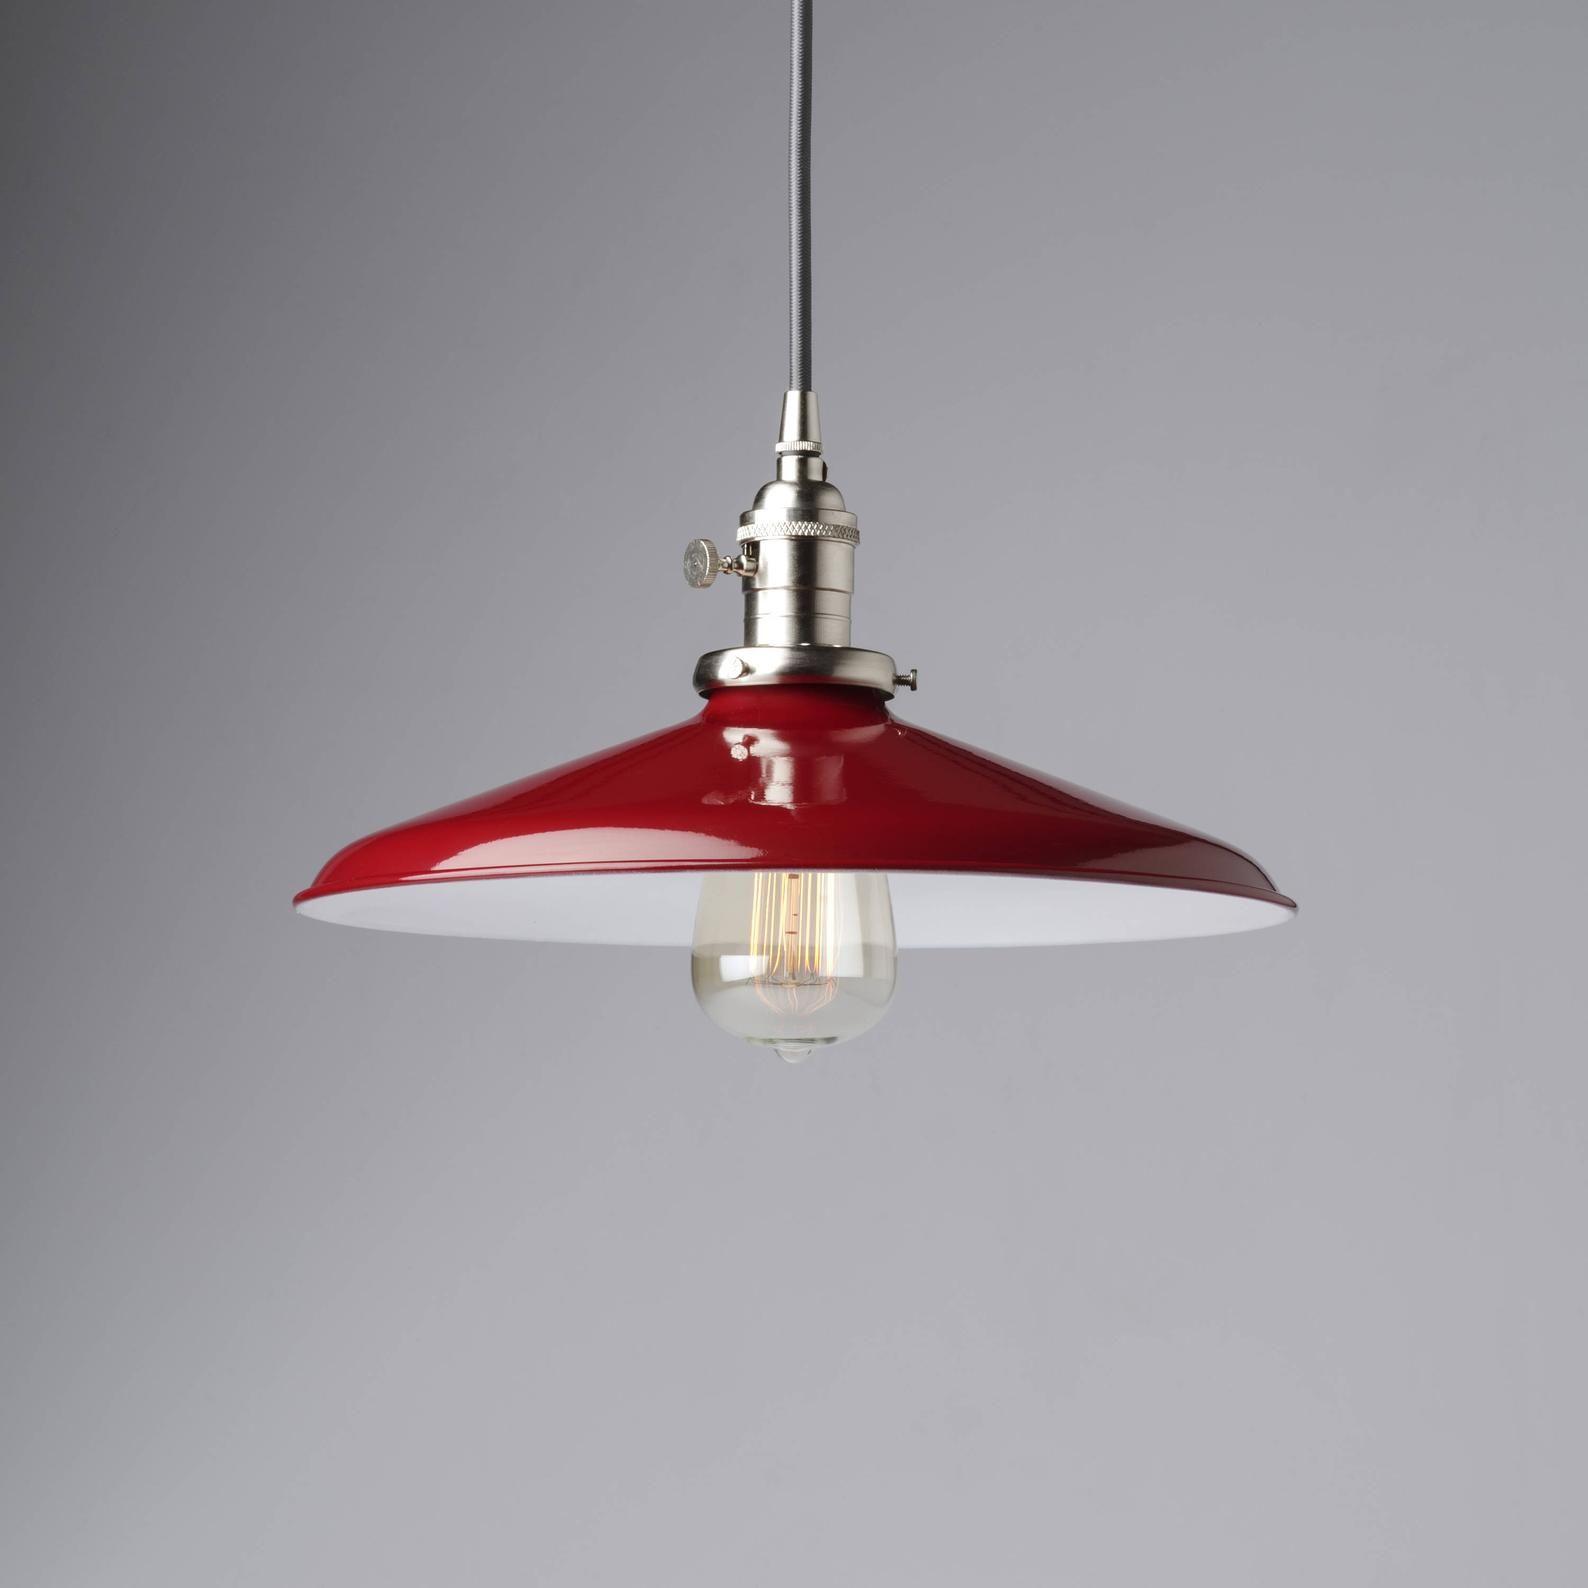 Pendant Light Fixture Red 14 Metal Porcelain Enamel Vintage Etsy In 2020 Industrial Light Fixtures Pendant Light Fixtures Pendant Light